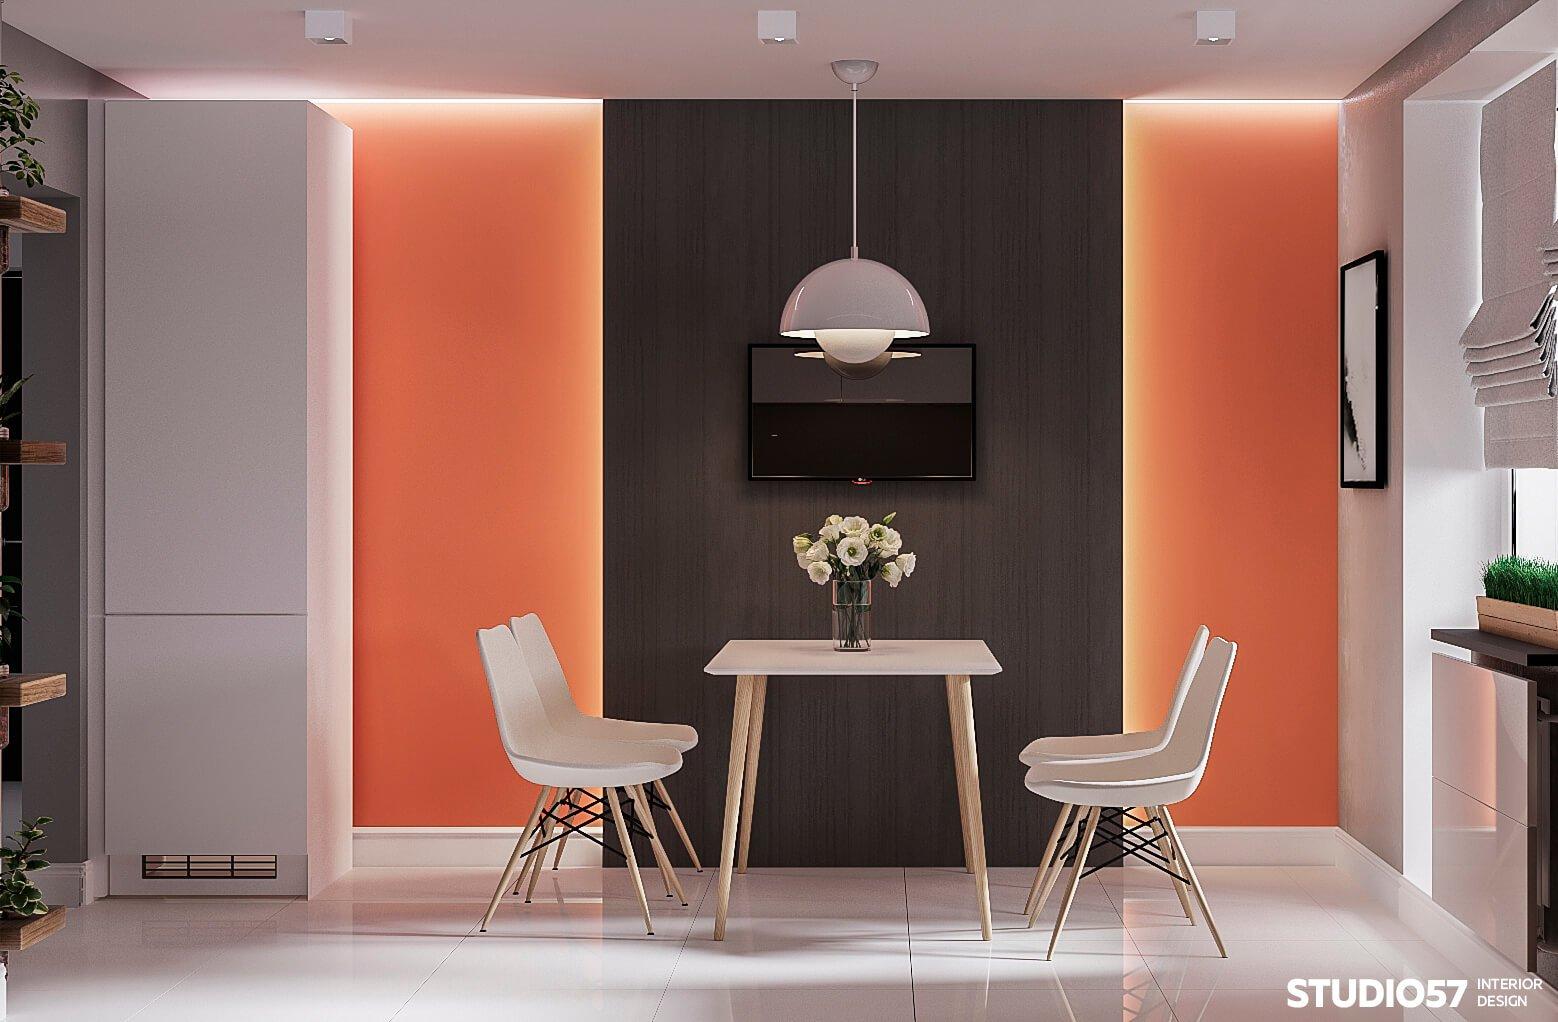 оранжевый цвет стен +на кухне